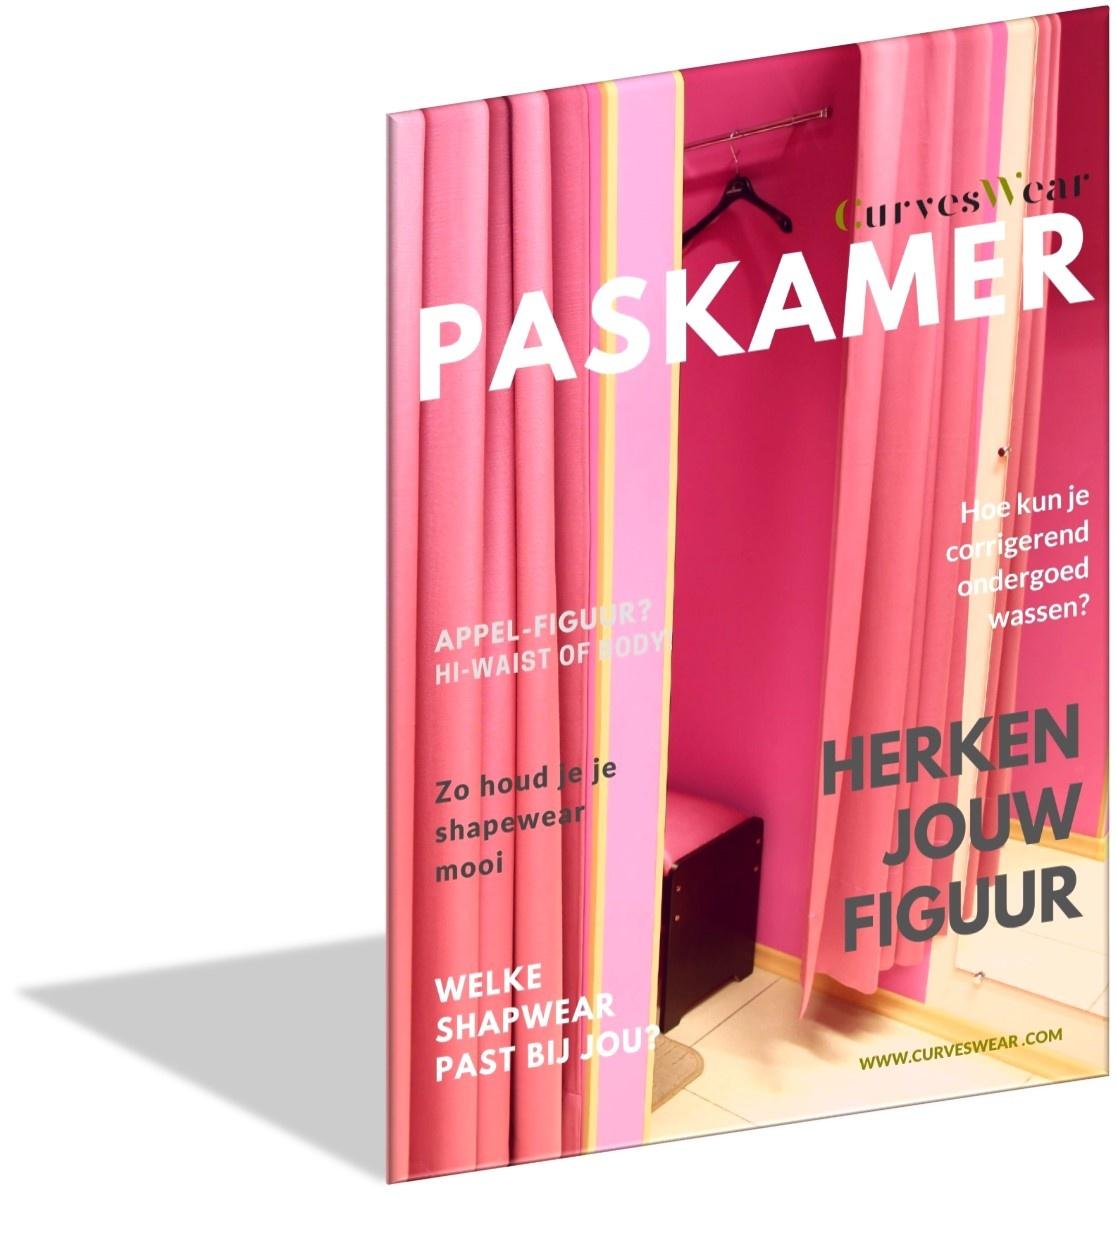 Curveswear Paskamer